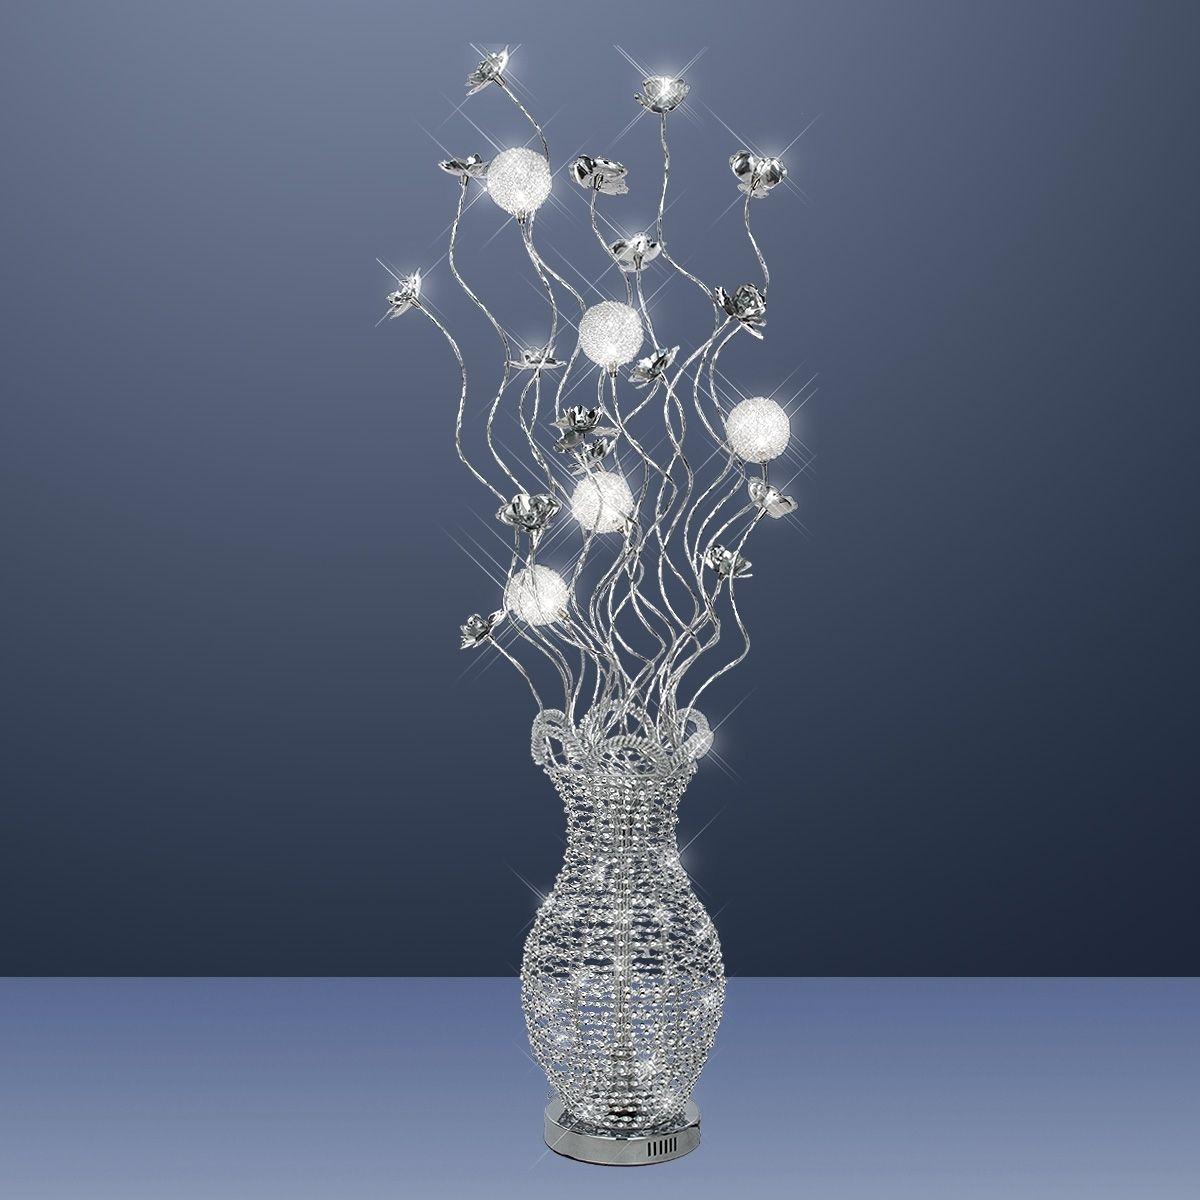 Pin by ladendirekt on Stehlampen | Pinterest